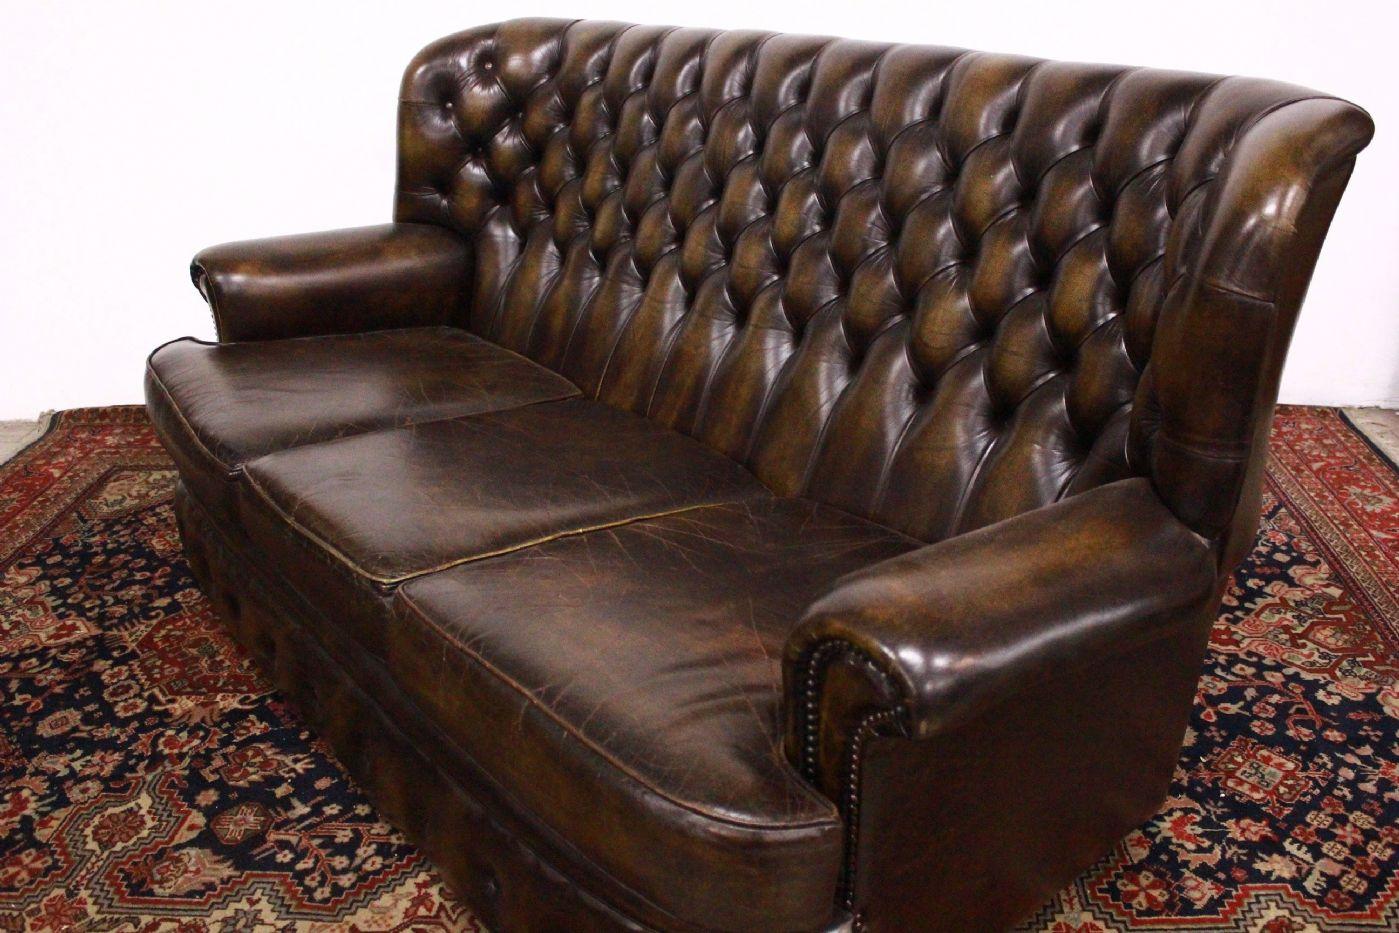 Original Chesterfield Sofa 3 Seats Dark Skin Mustard English